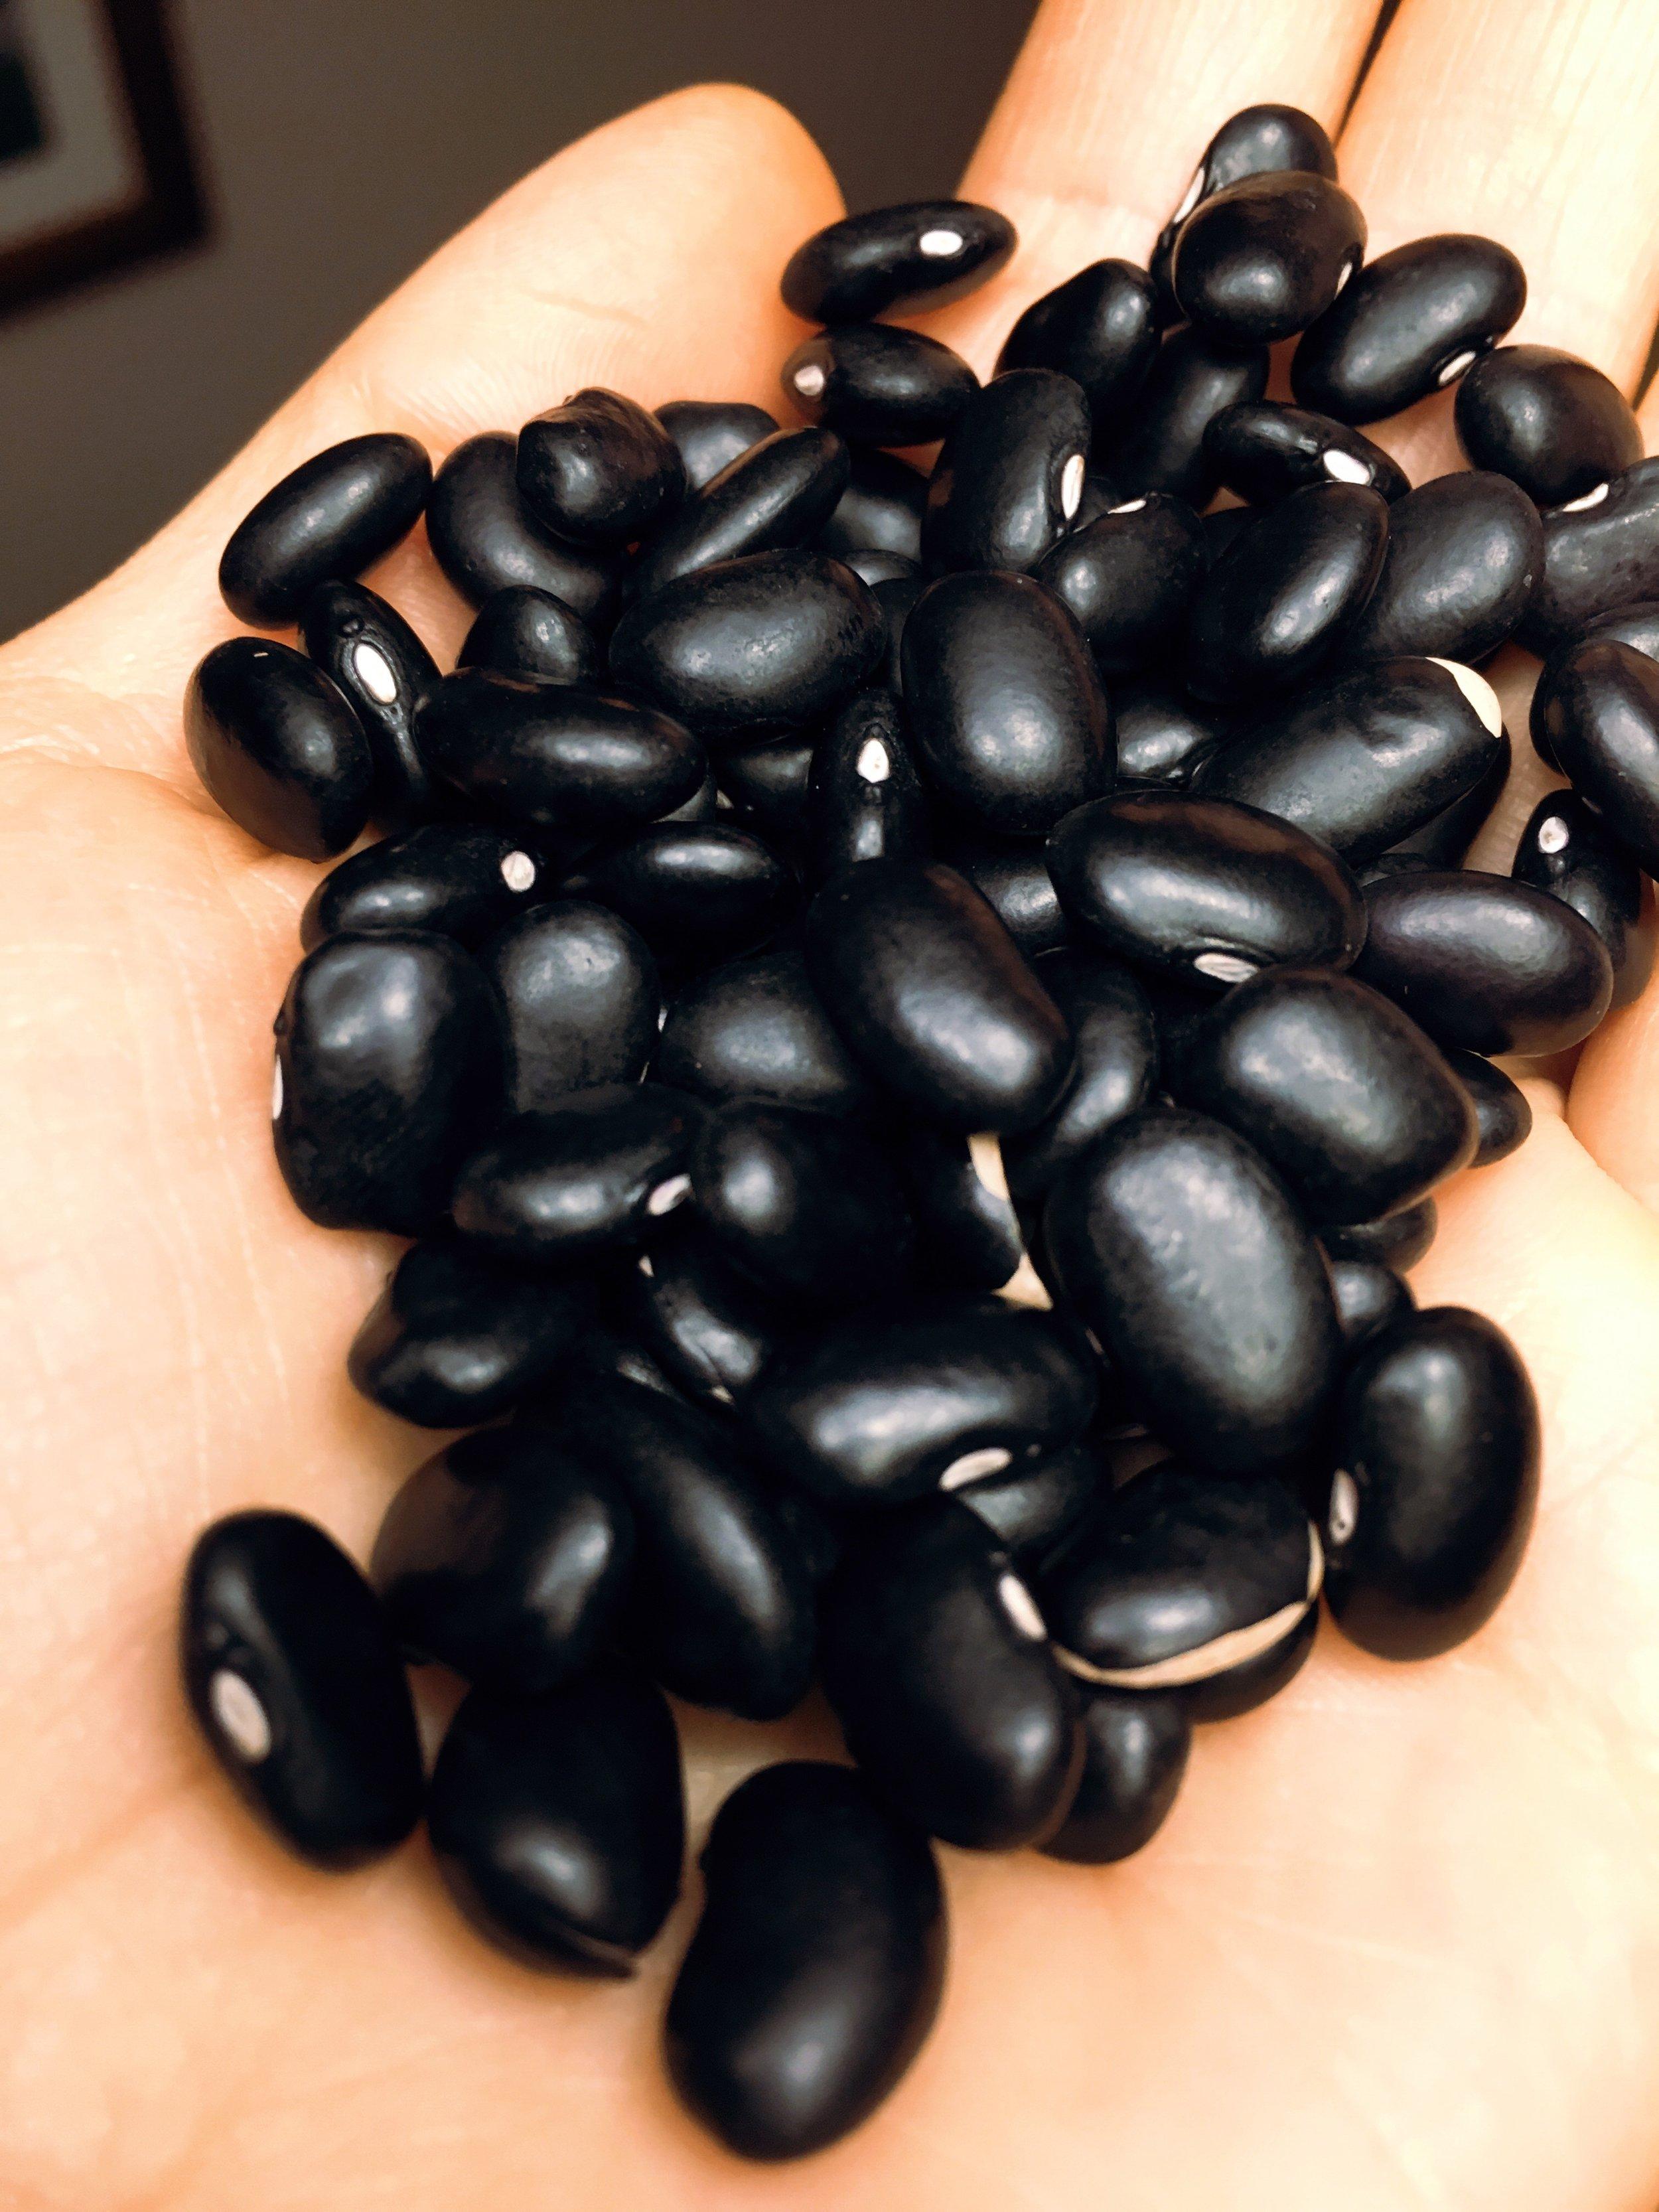 Black beans -